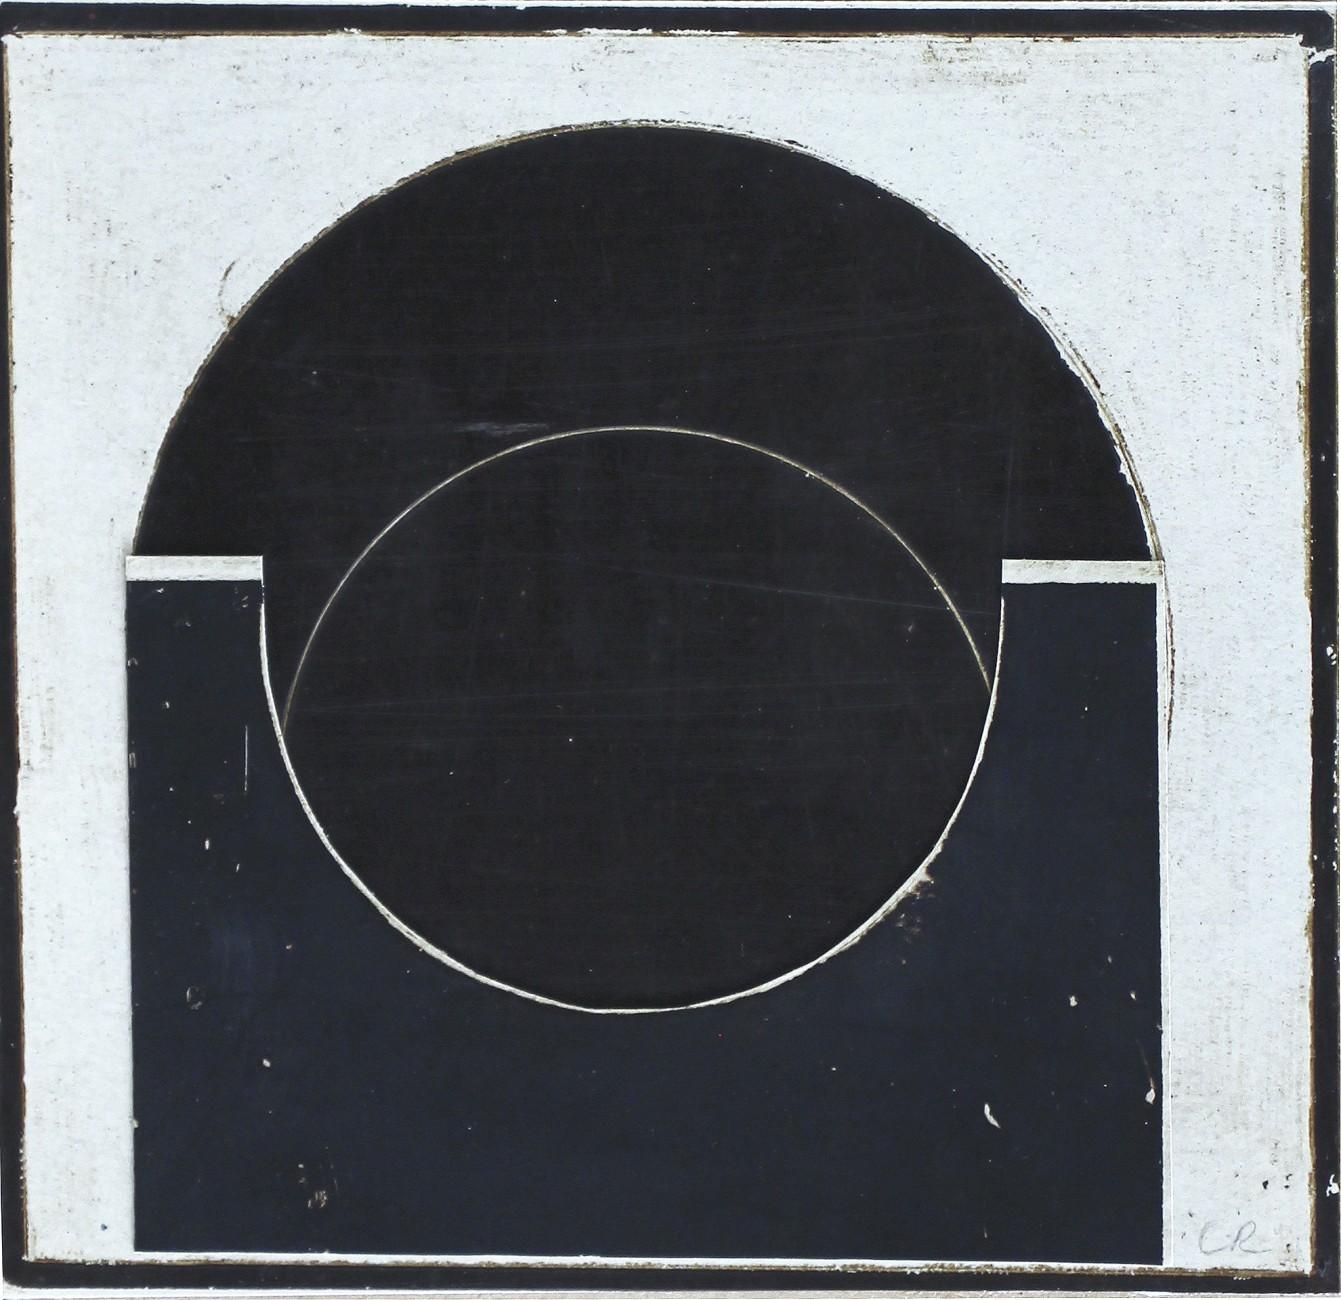 Doble-Circulo-1-165x17cm